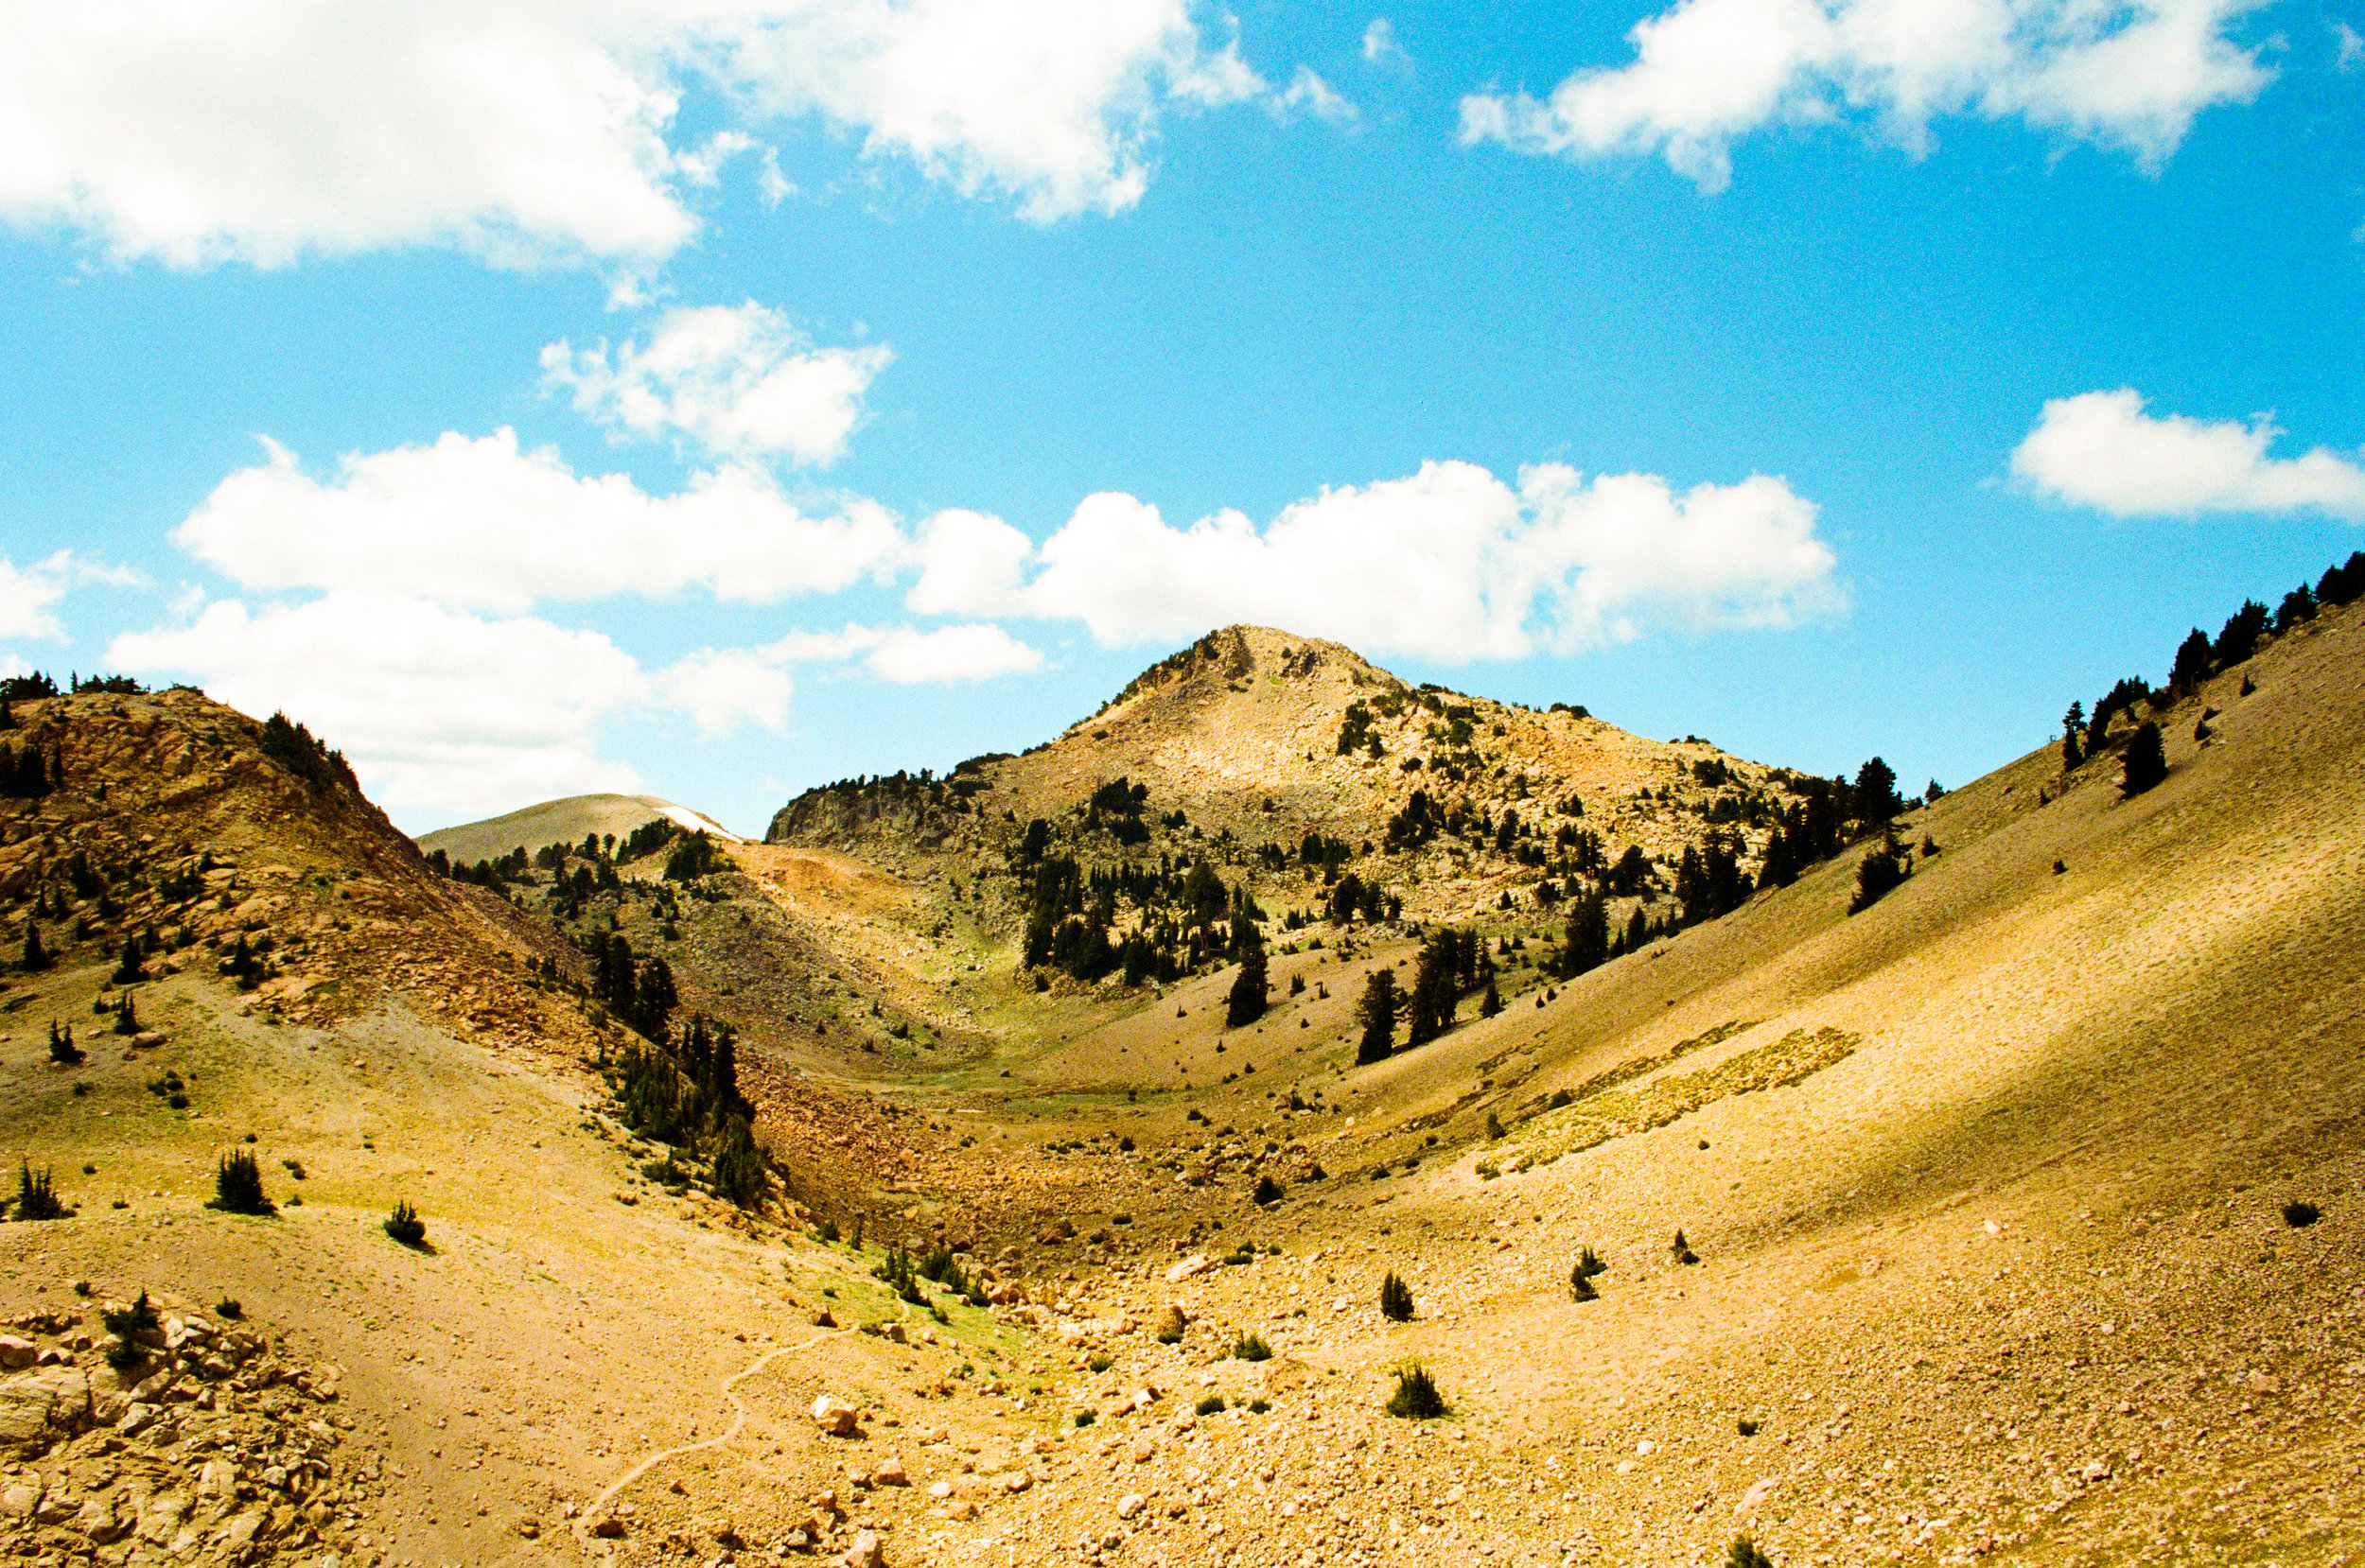 Mount Lassen National Park, California